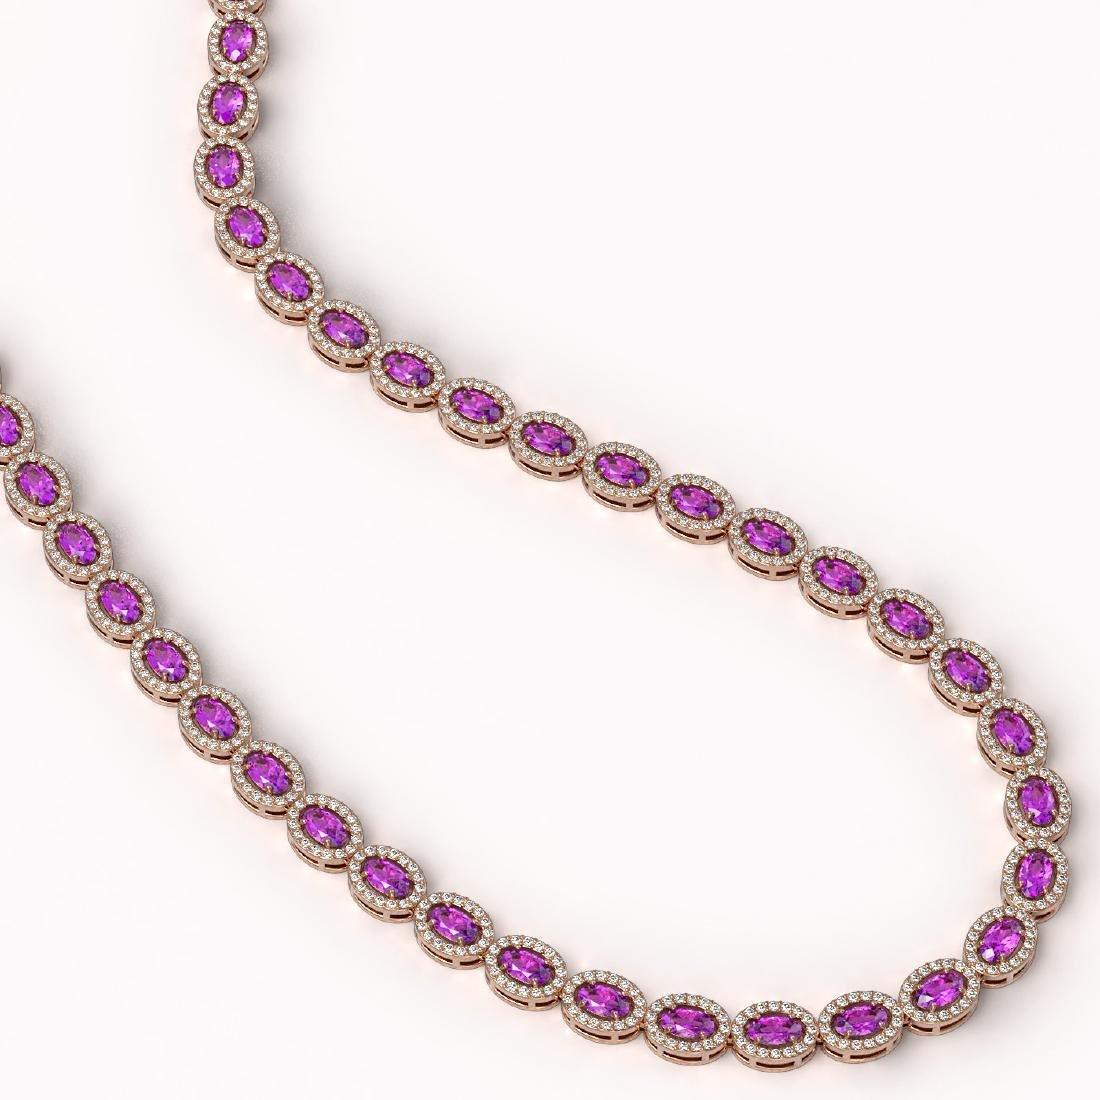 20.62 CTW Amethyst & Diamond Halo Necklace 10K Rose